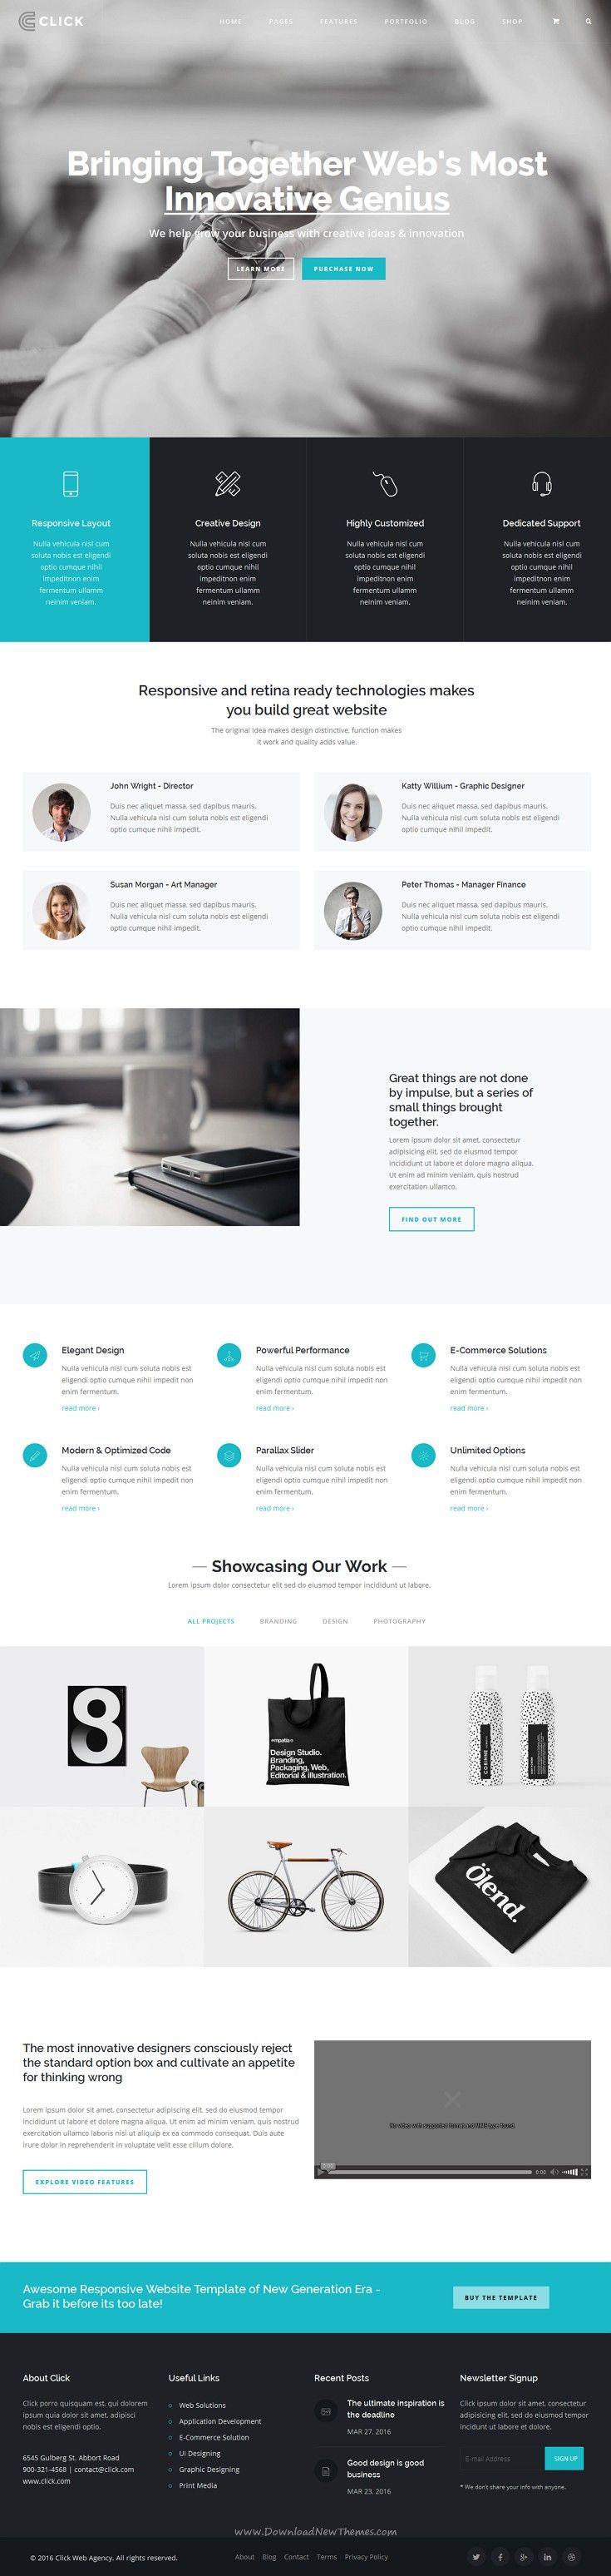 Click Multi Purpose Responsive Website Template 341